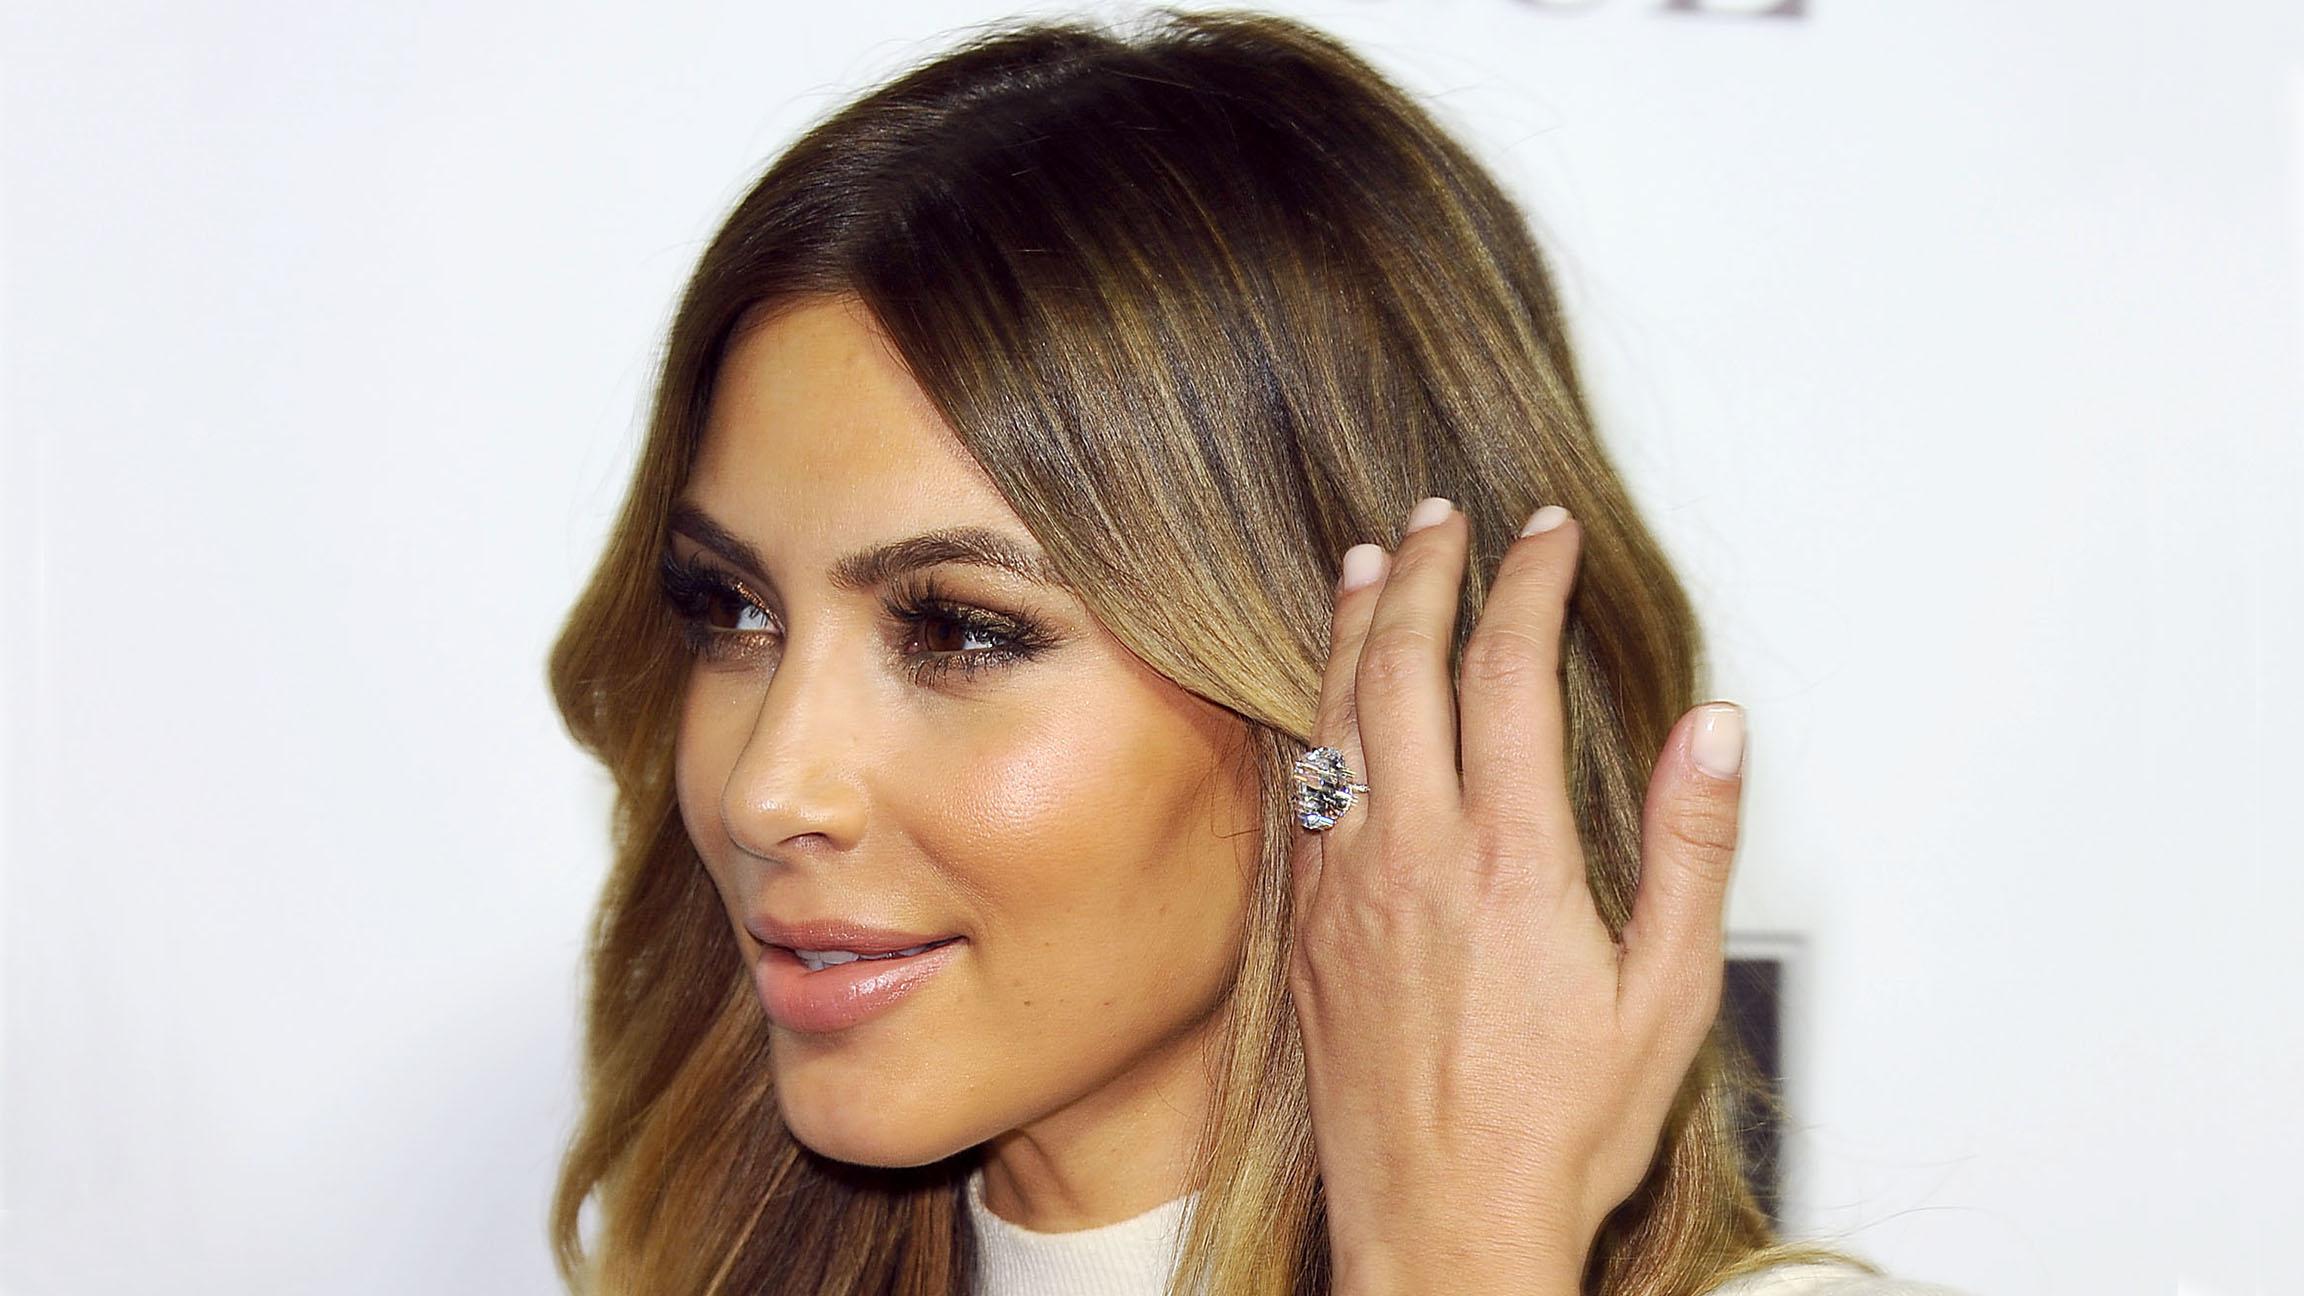 Kourtney Kardashian Revealed That a Member of Her Staff Robbed Her on Sunday's KUWTK